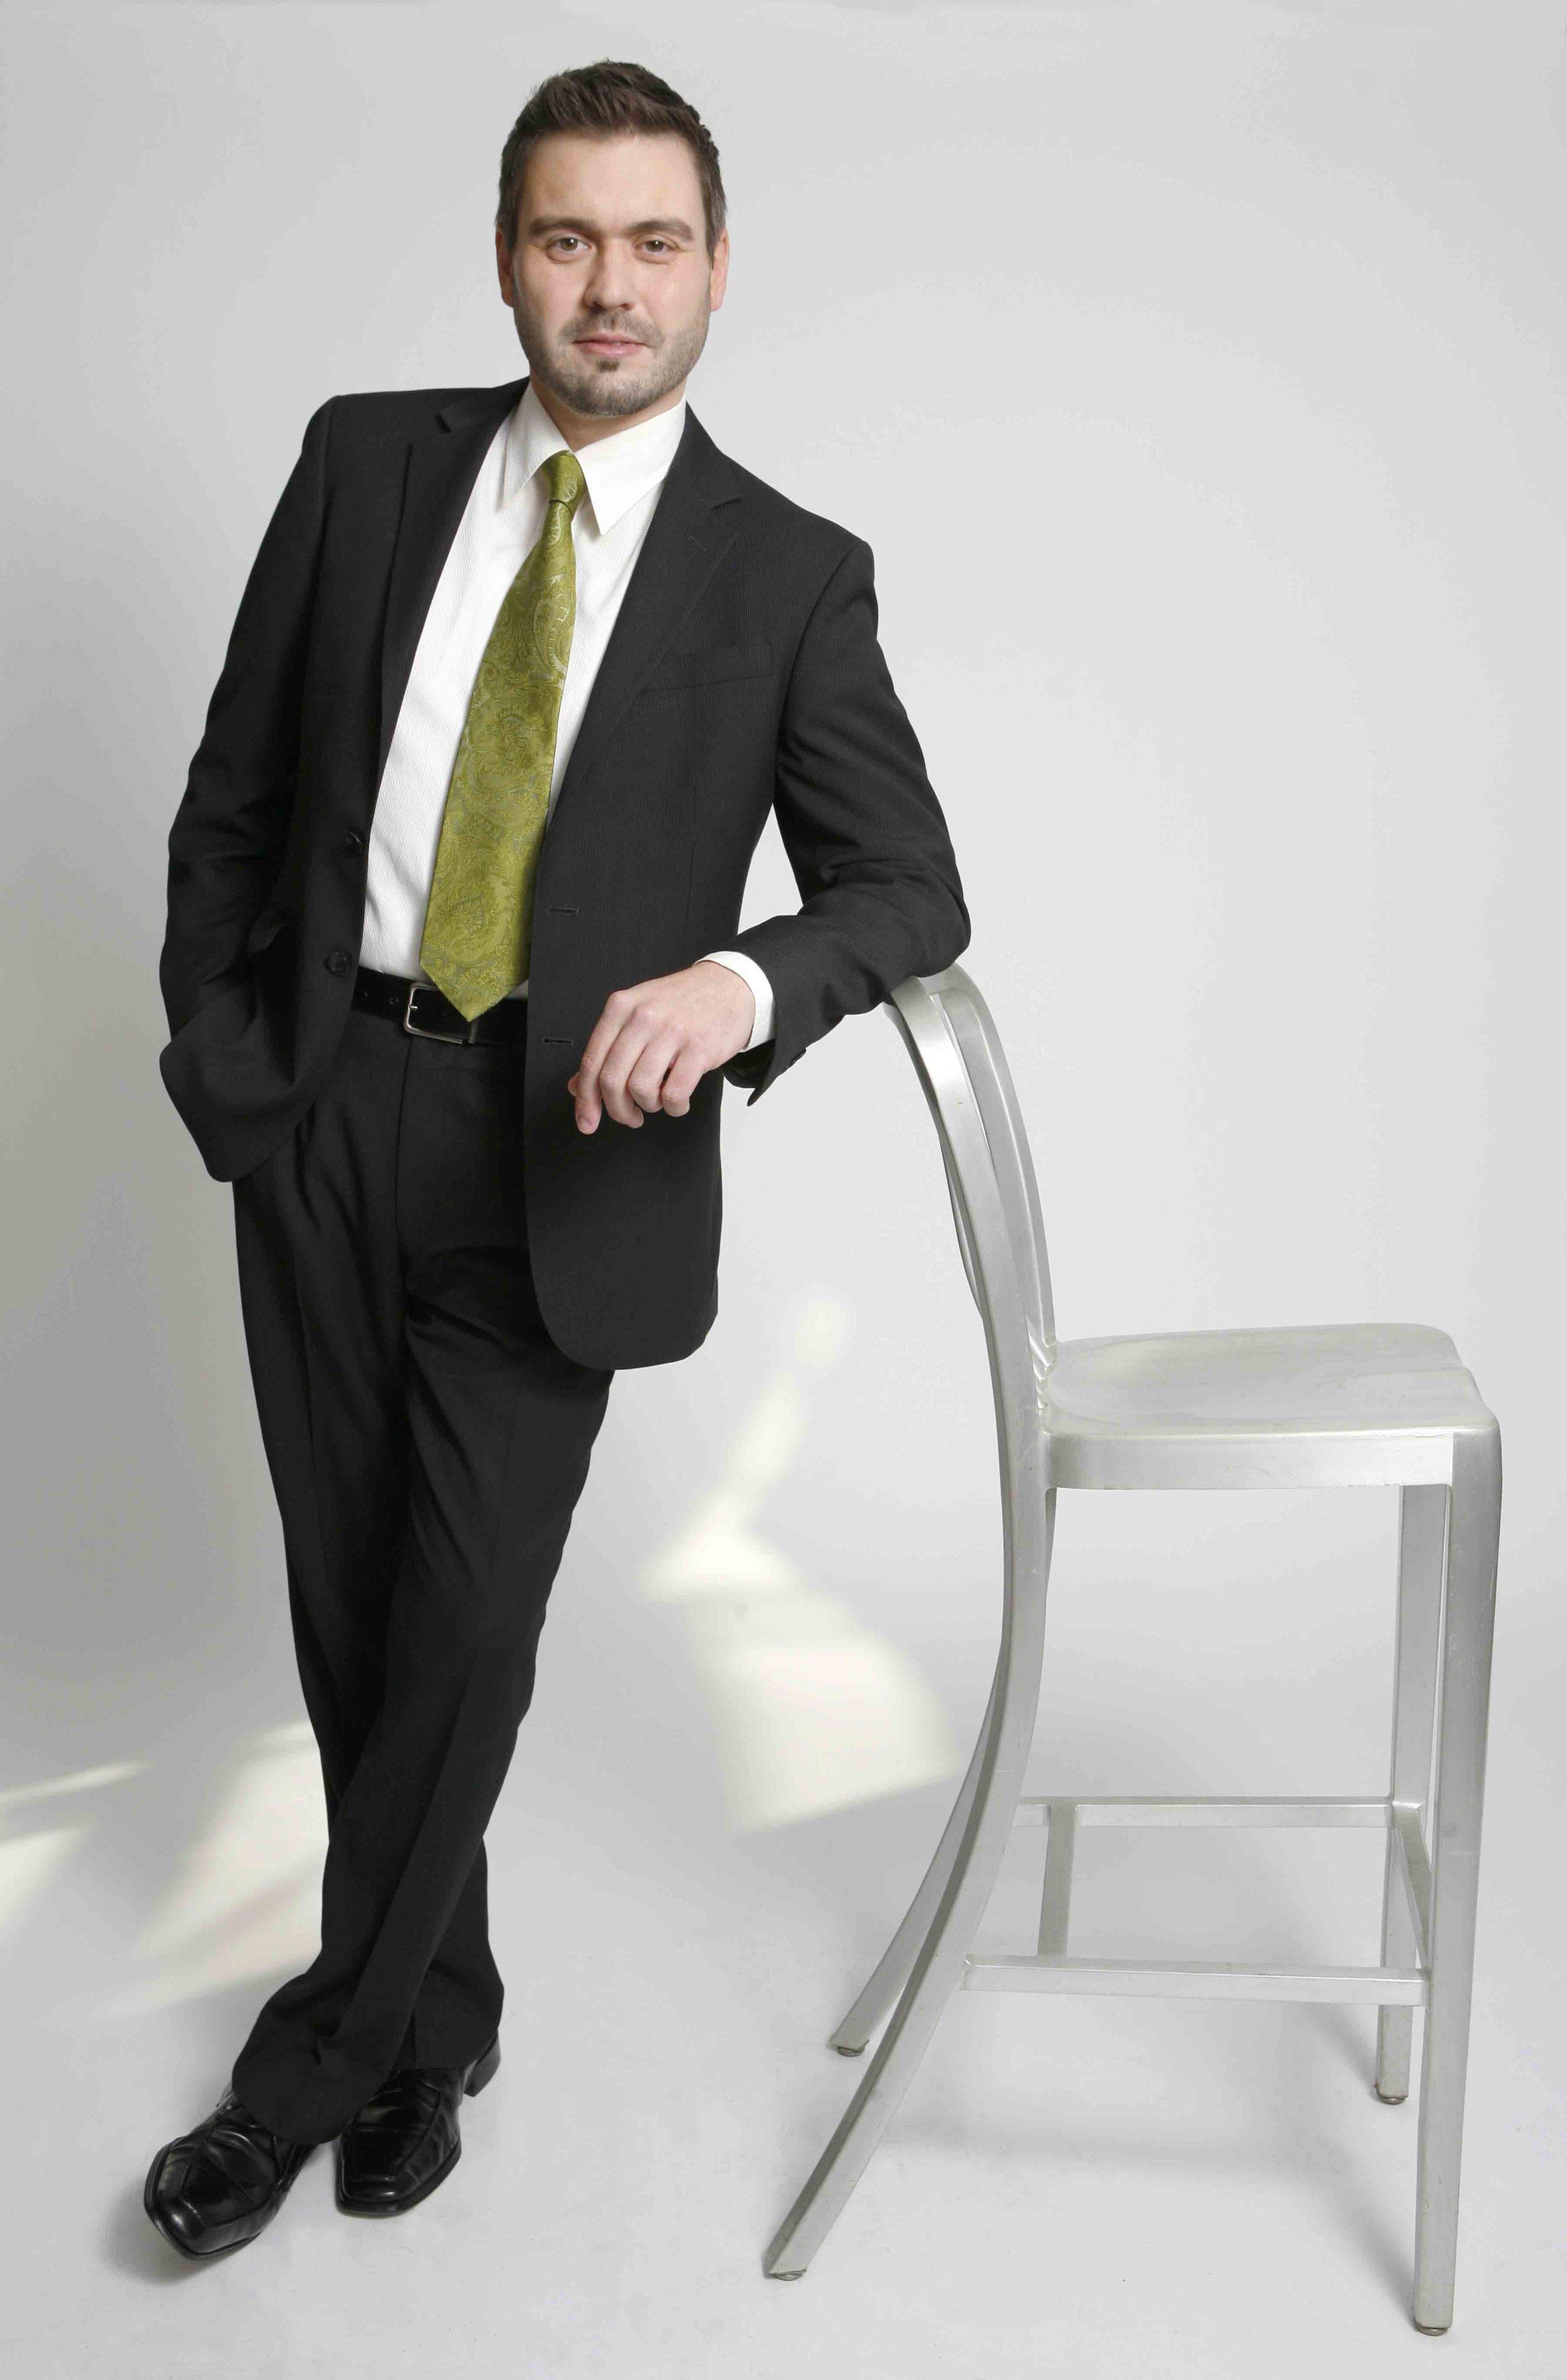 Mischa Bouvier, baritone